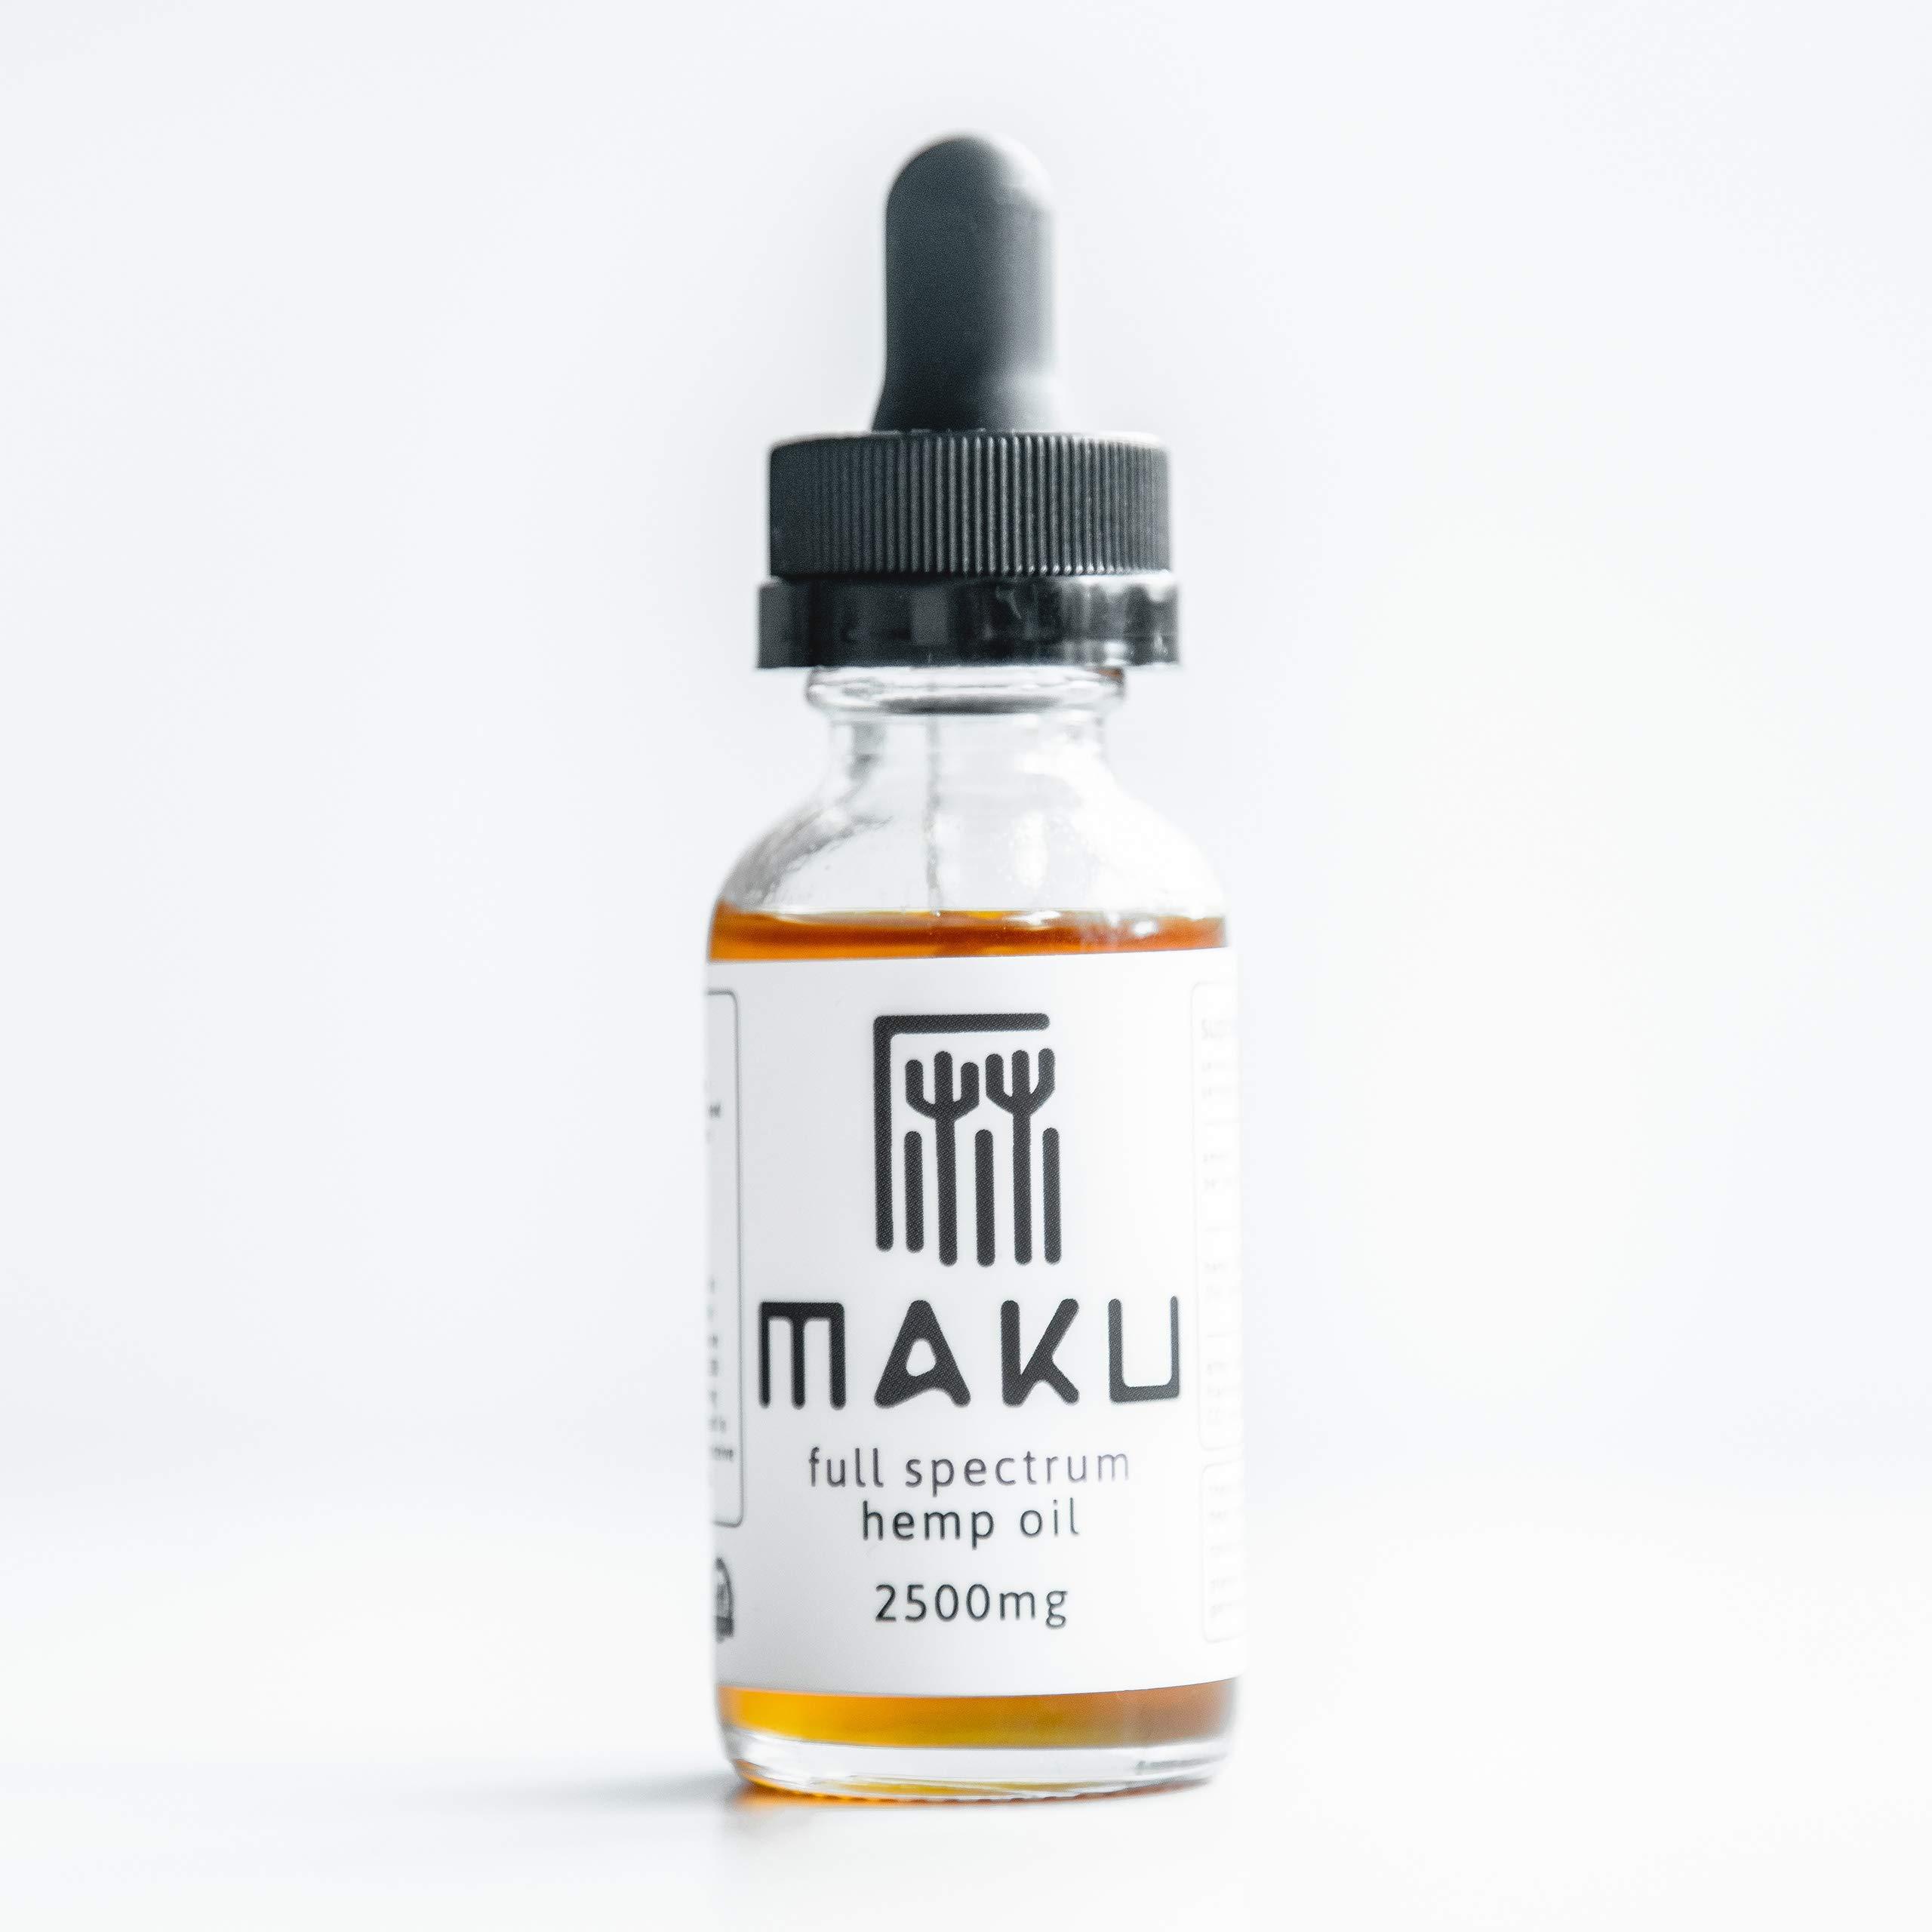 Maku Full Spectrum Hemp Oil Elixir (1000mg | 2500mg) - Rich in Omega-3